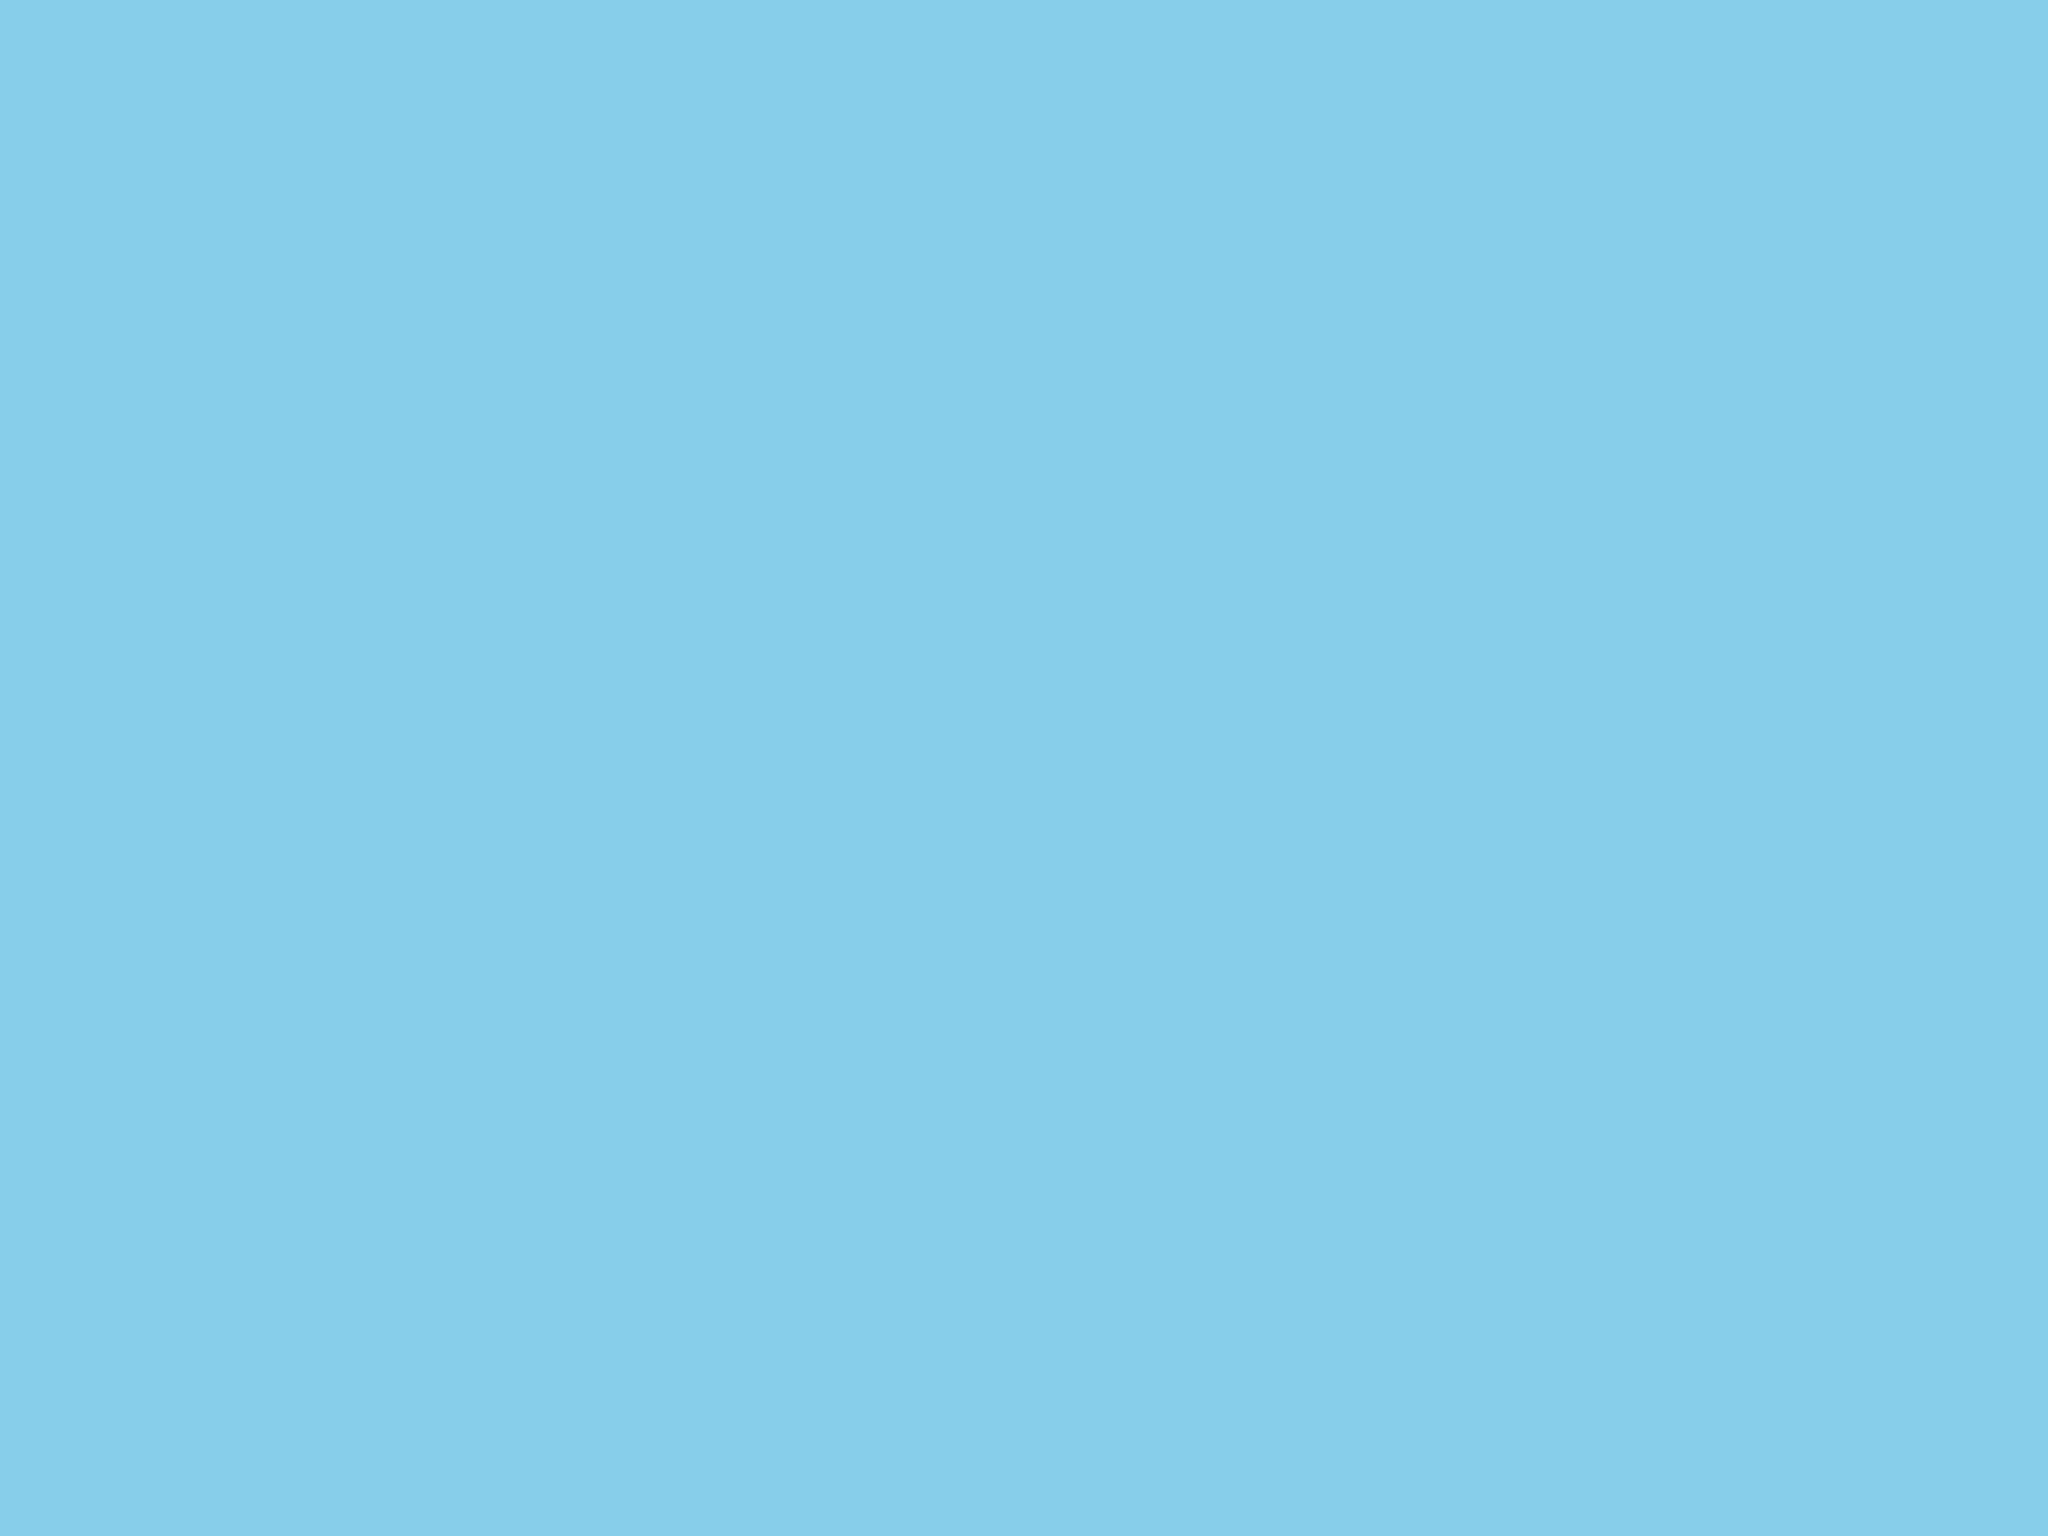 2048x1536 Sky Blue Solid Color Background